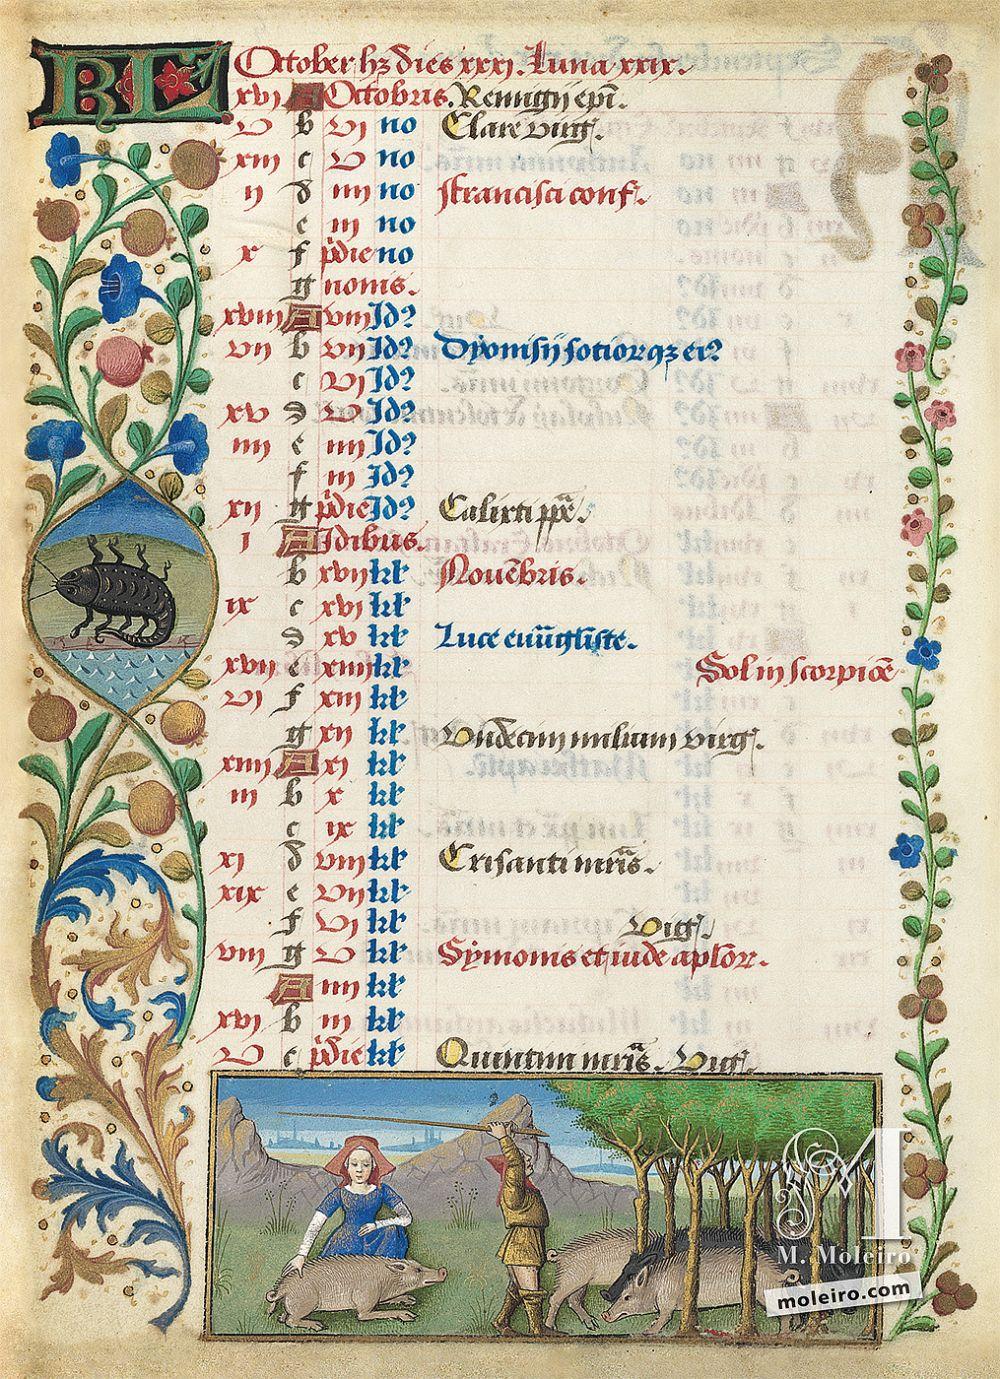 Les Heures de Charles d'Angoulême Calendrier octobre (f. 5v)